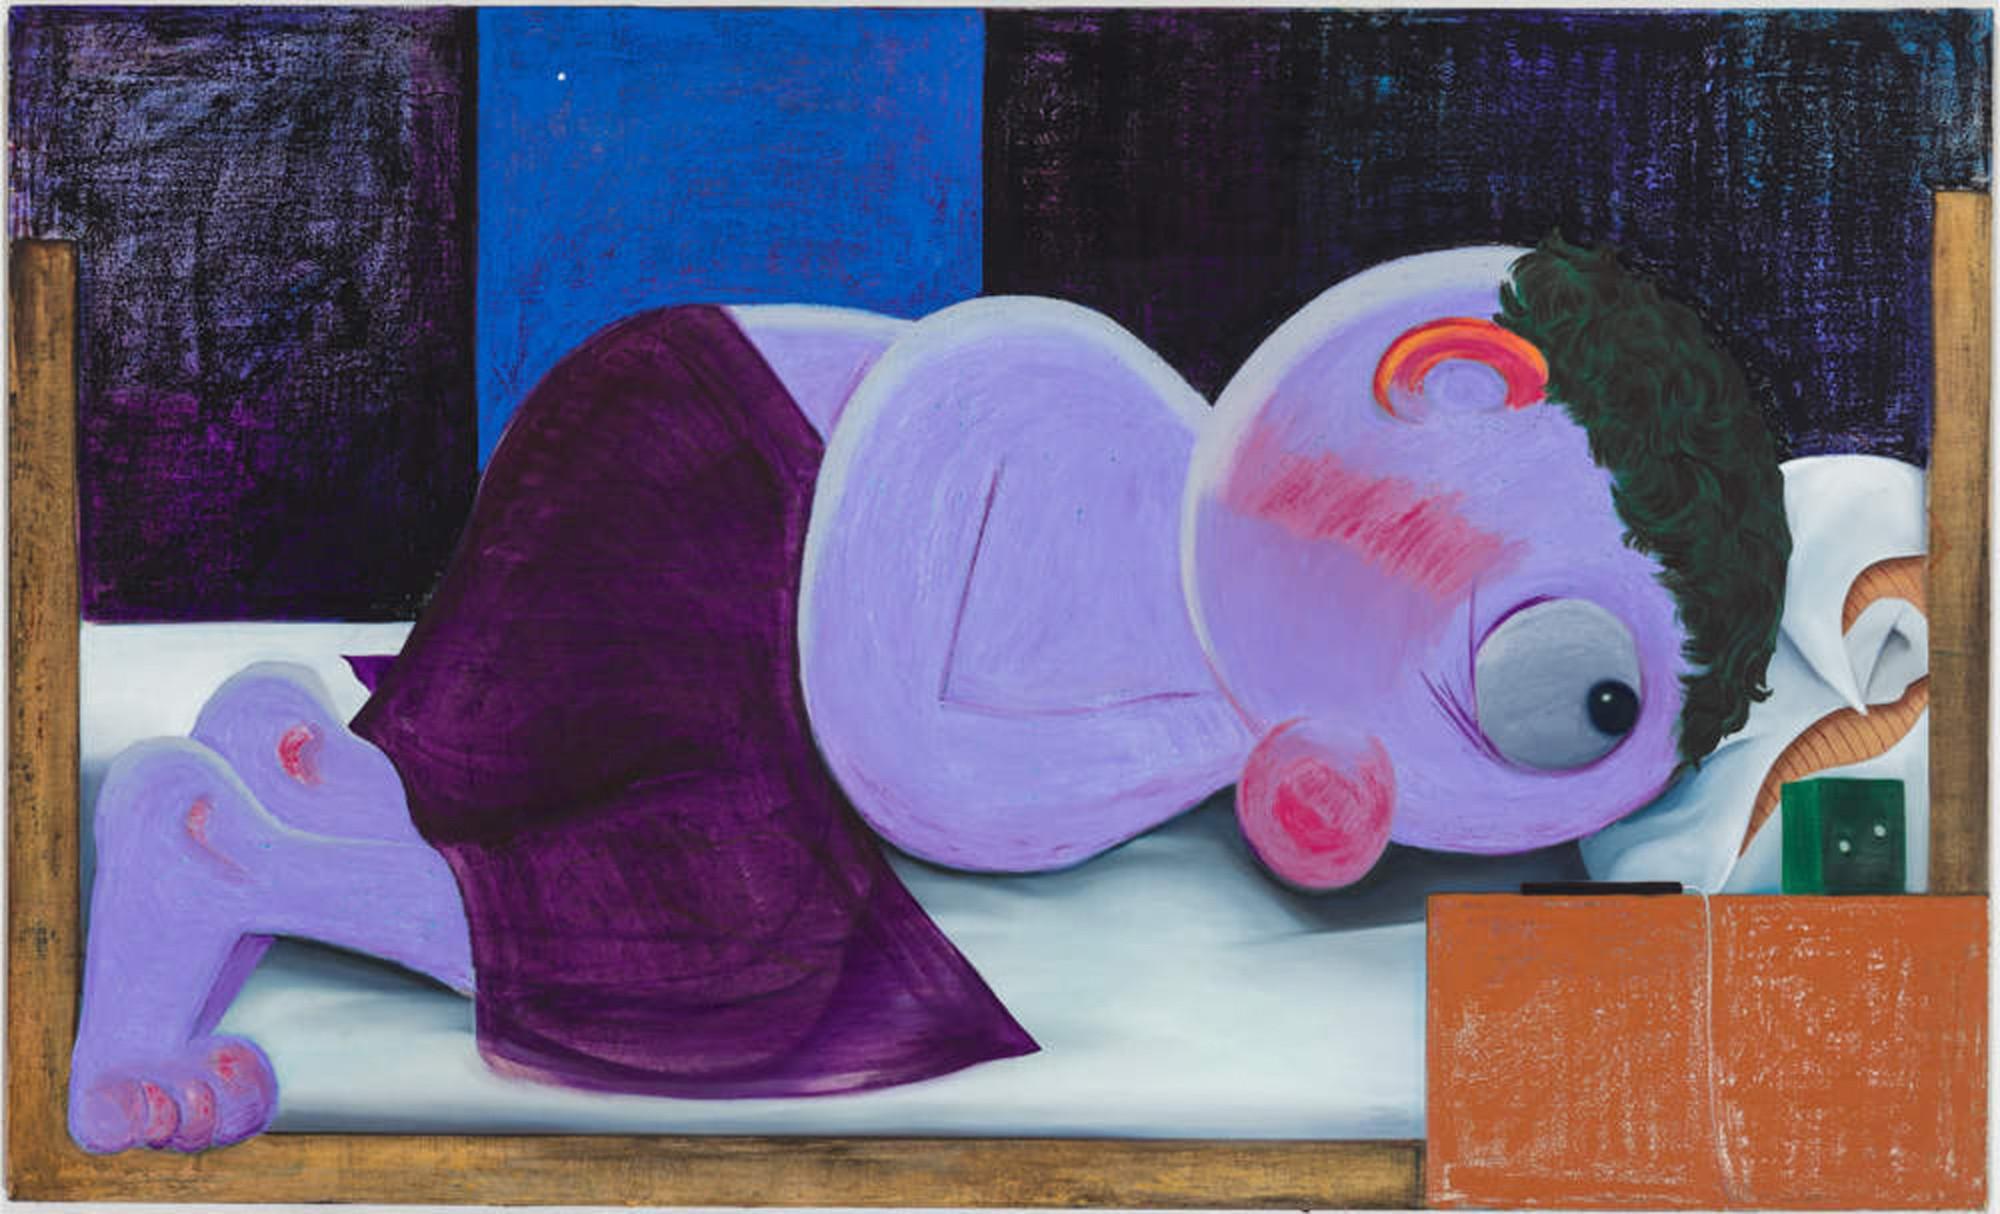 "<div class=""artwork_caption""><p>Nicole Eisenman, Untitled, 2015</p></div>"